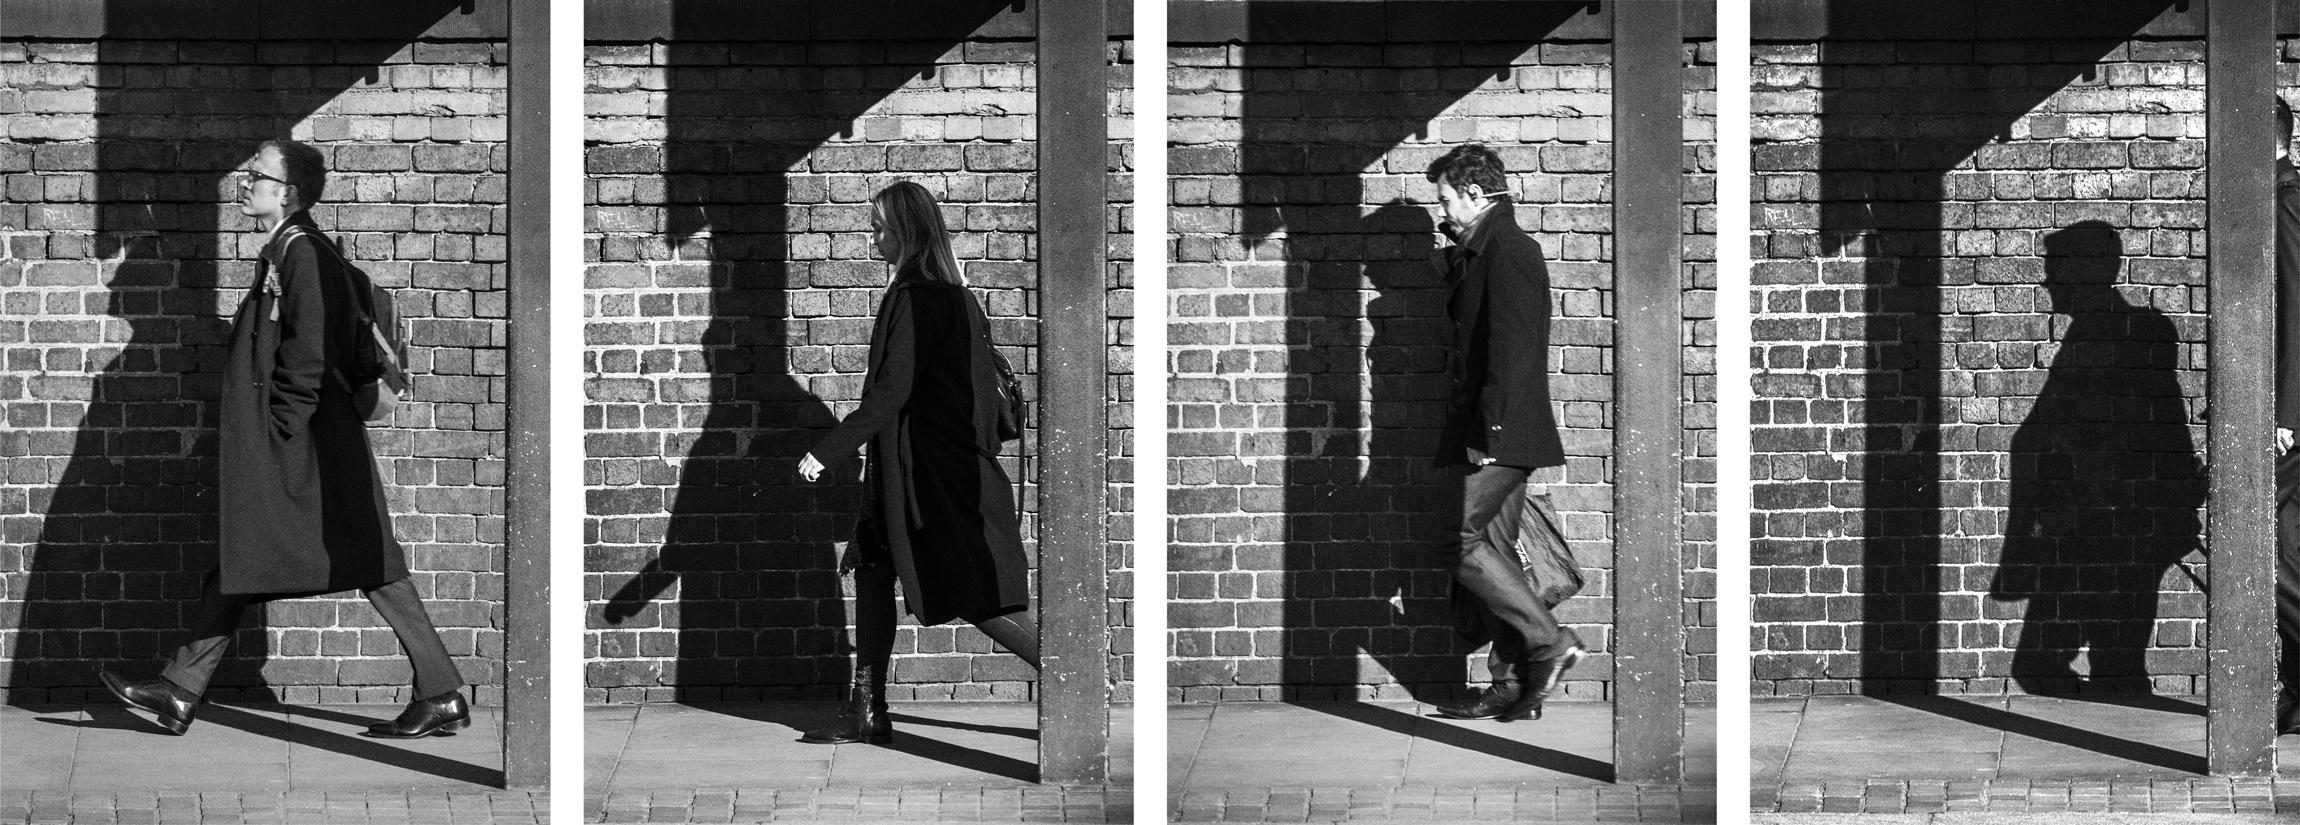 street-documentary-photography-fabio-burrelli-25.jpg